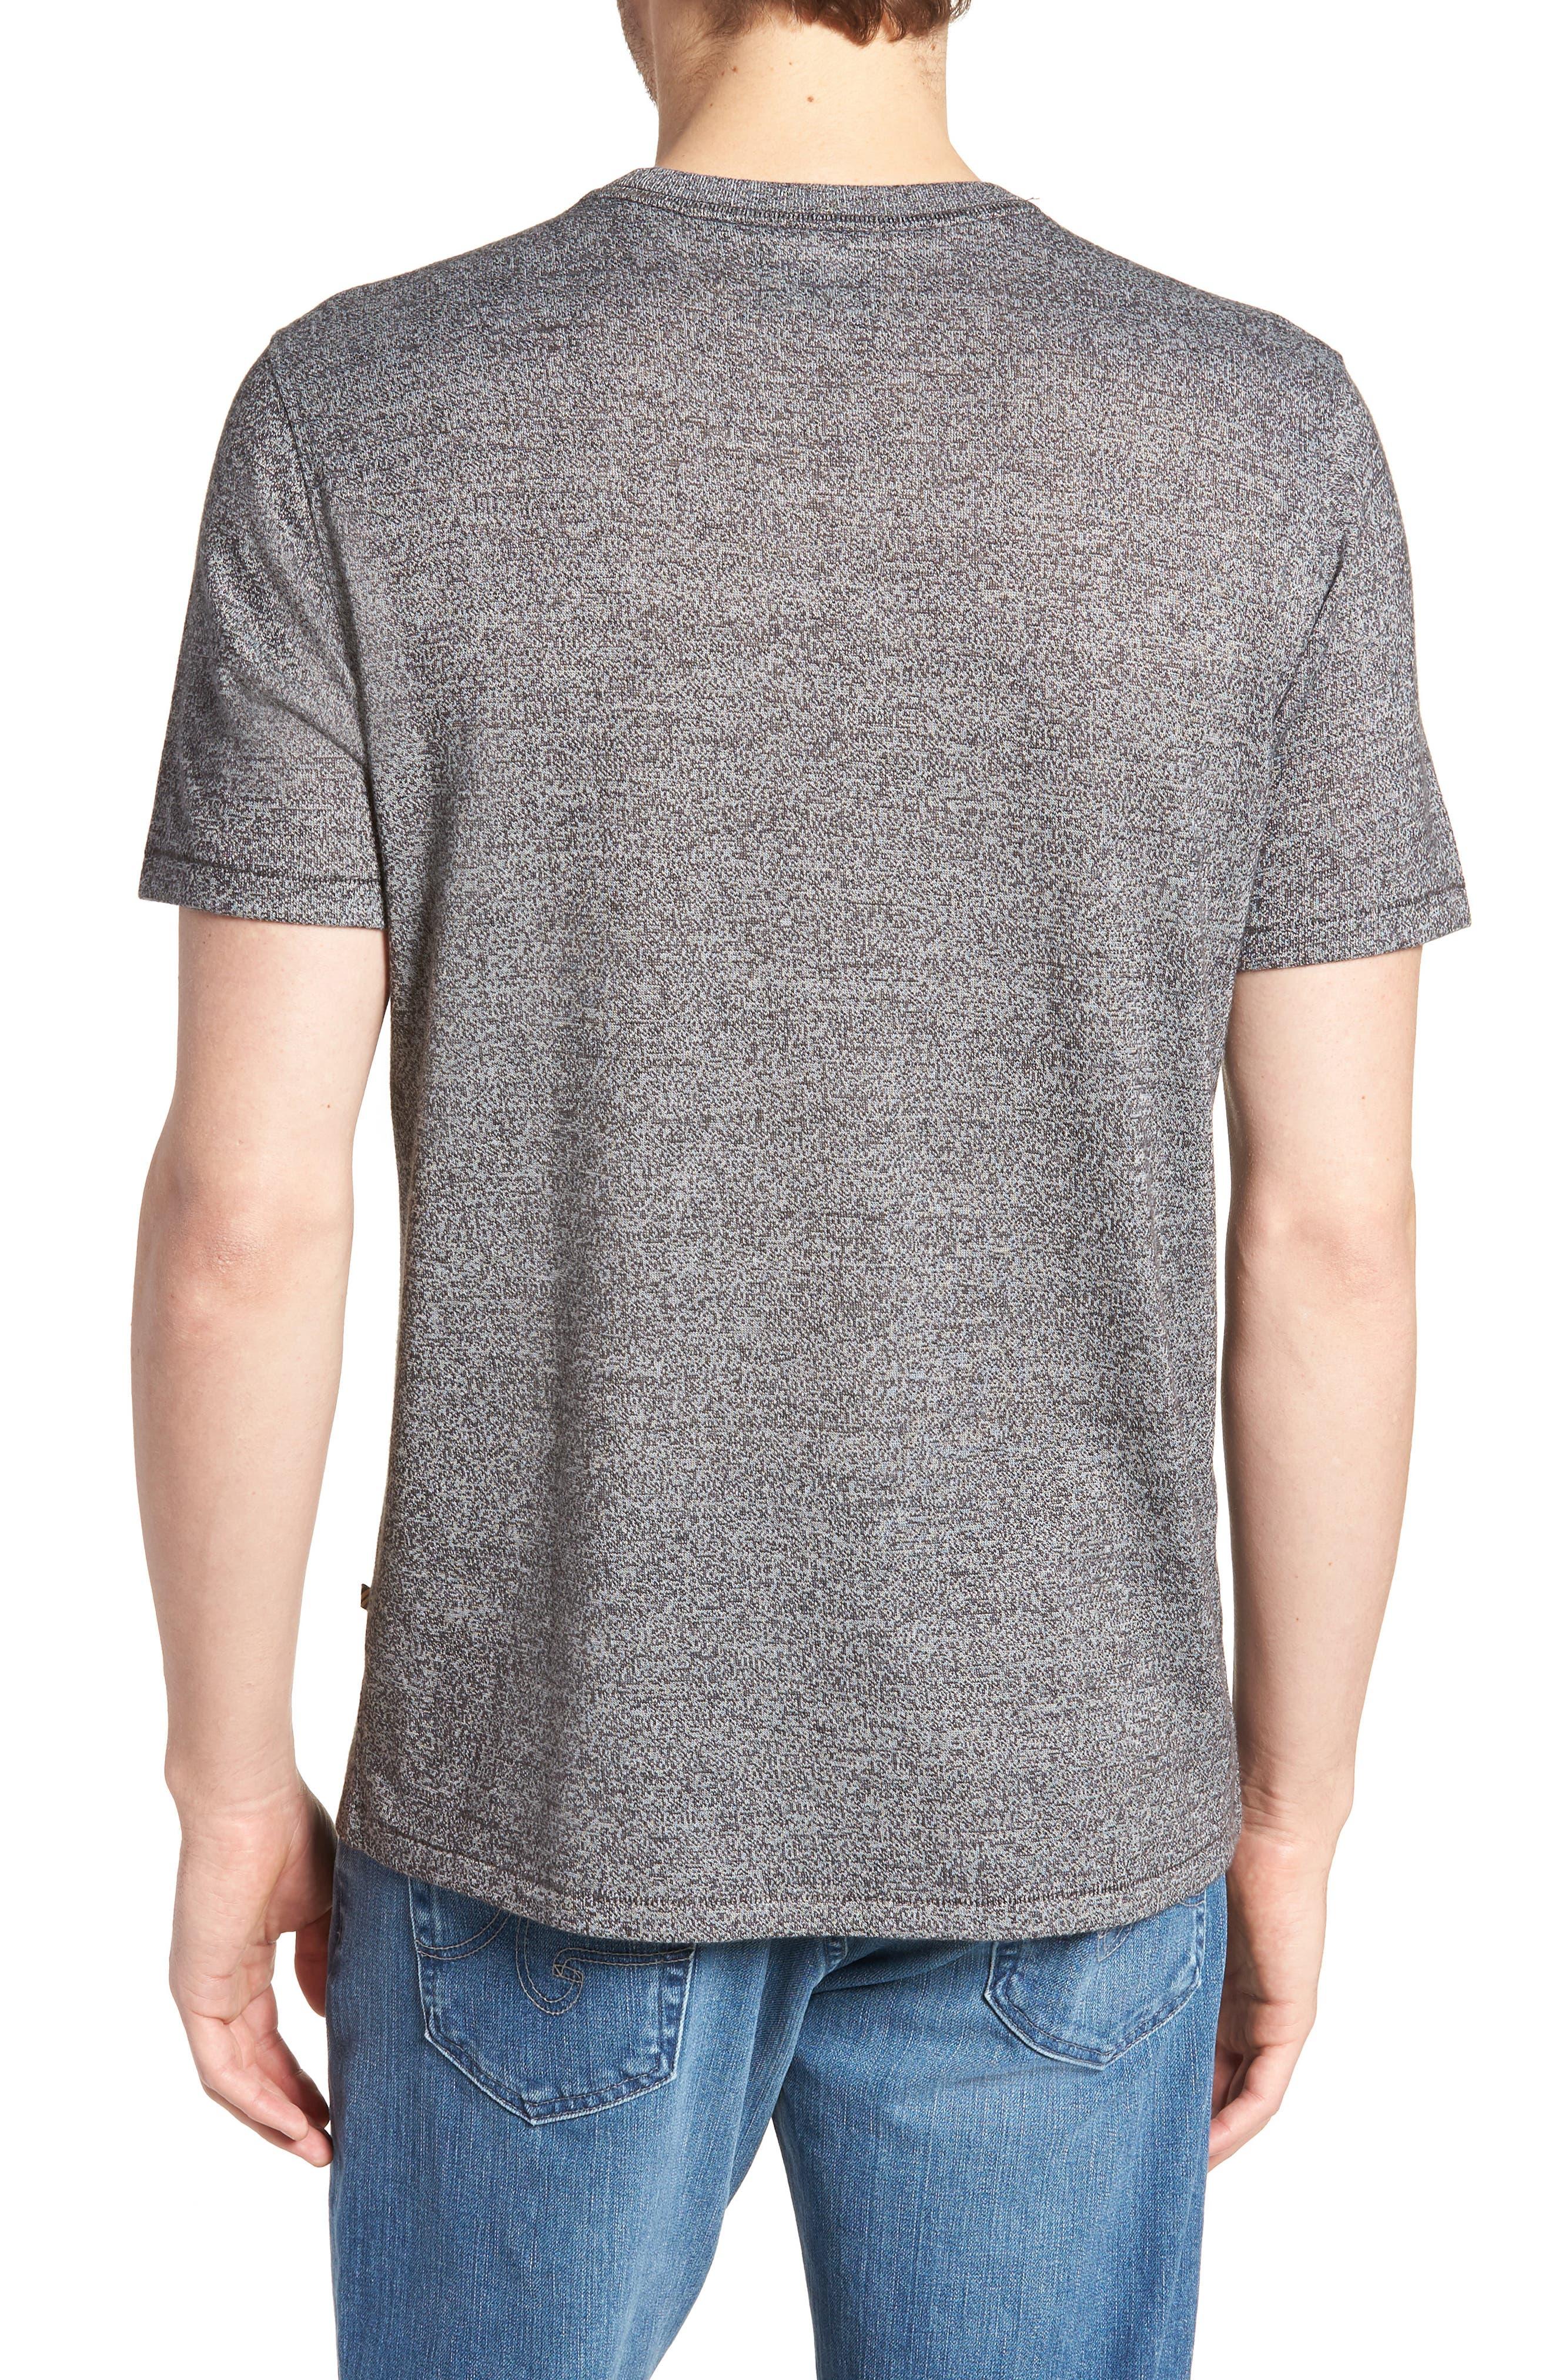 Mouline Pocket T-Shirt,                             Alternate thumbnail 2, color,                             Dark Grey